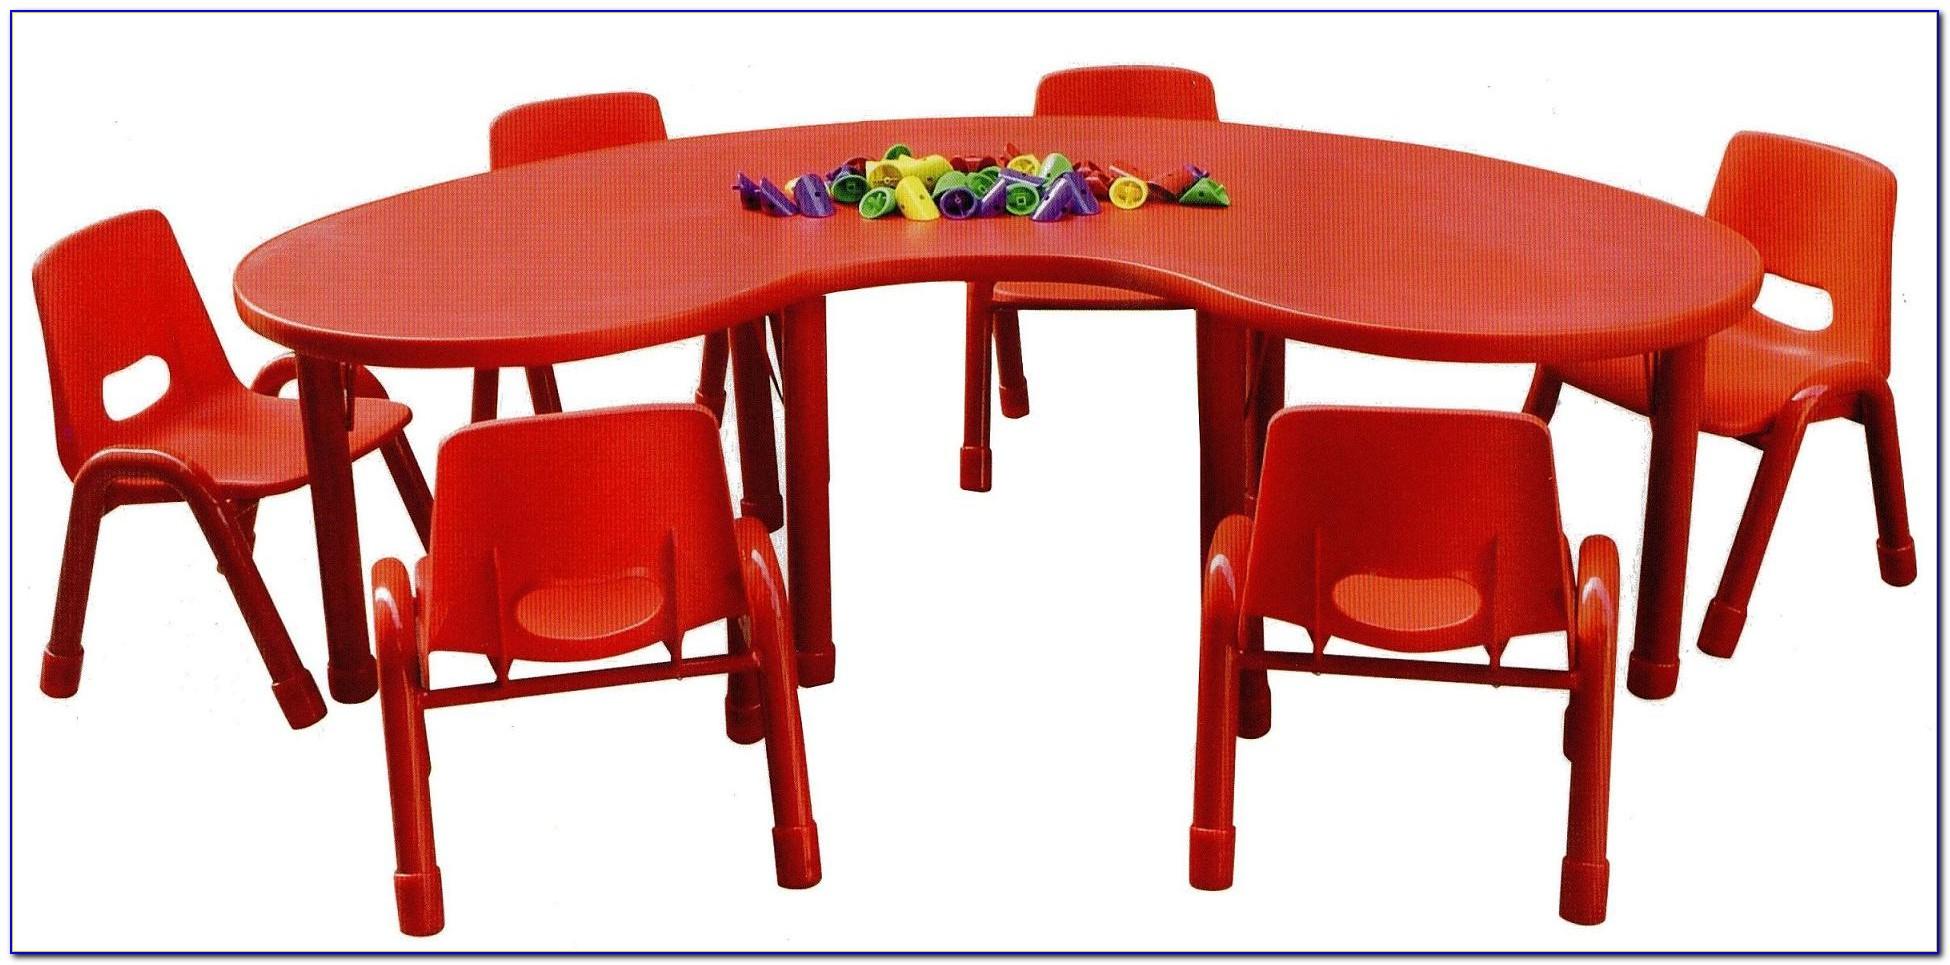 Kid Table And Chair Set Malaysia